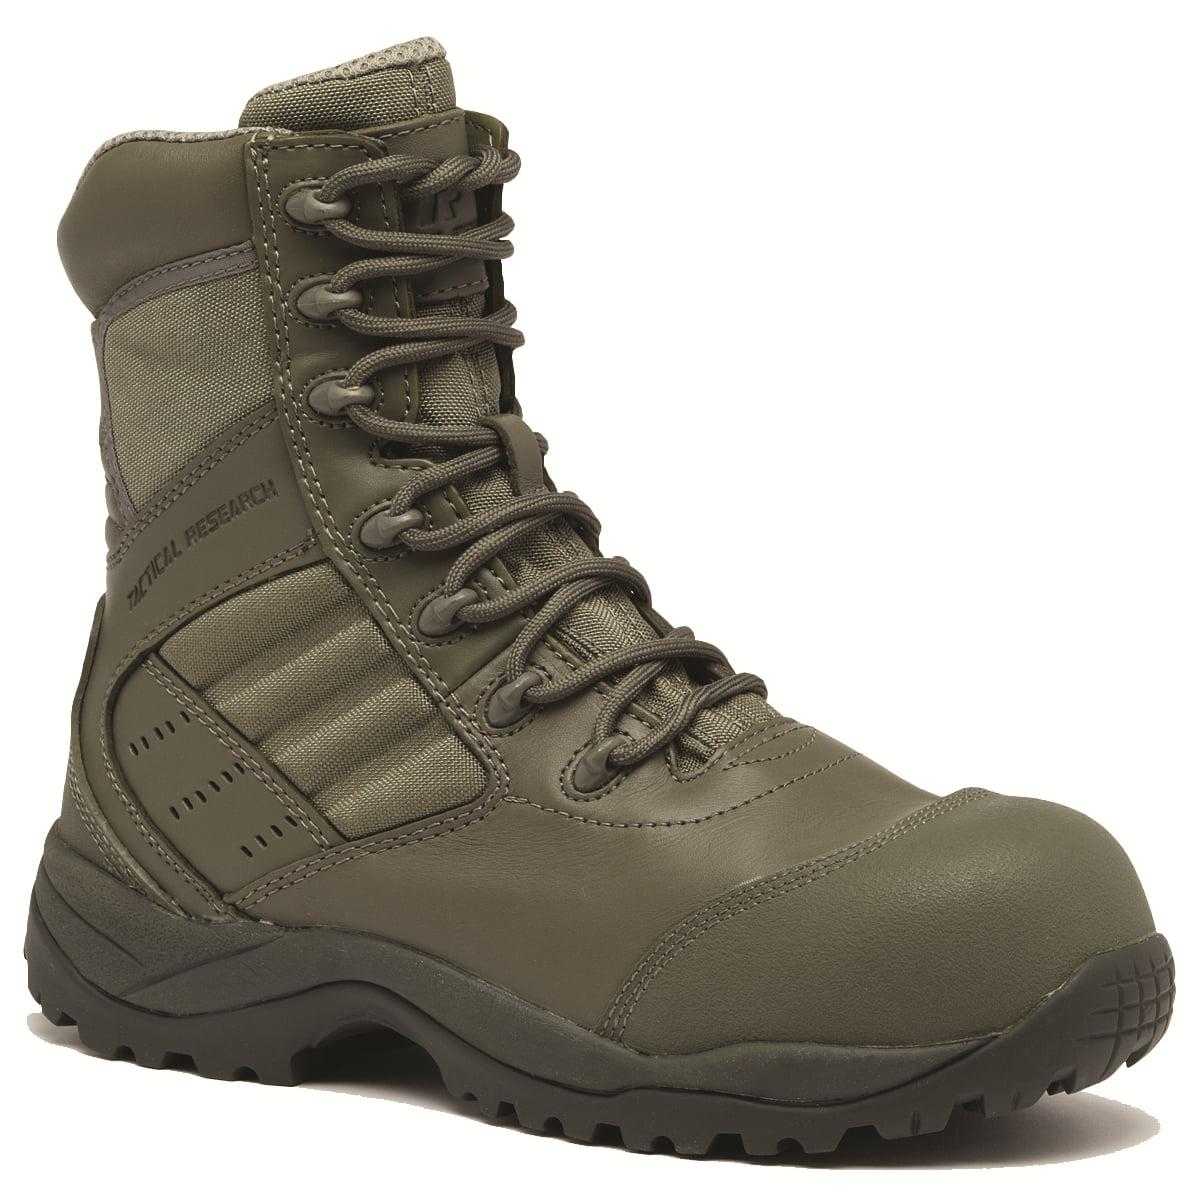 Belleville Maintainer Sage Green Lighweight Composite Toe Tactical Boot